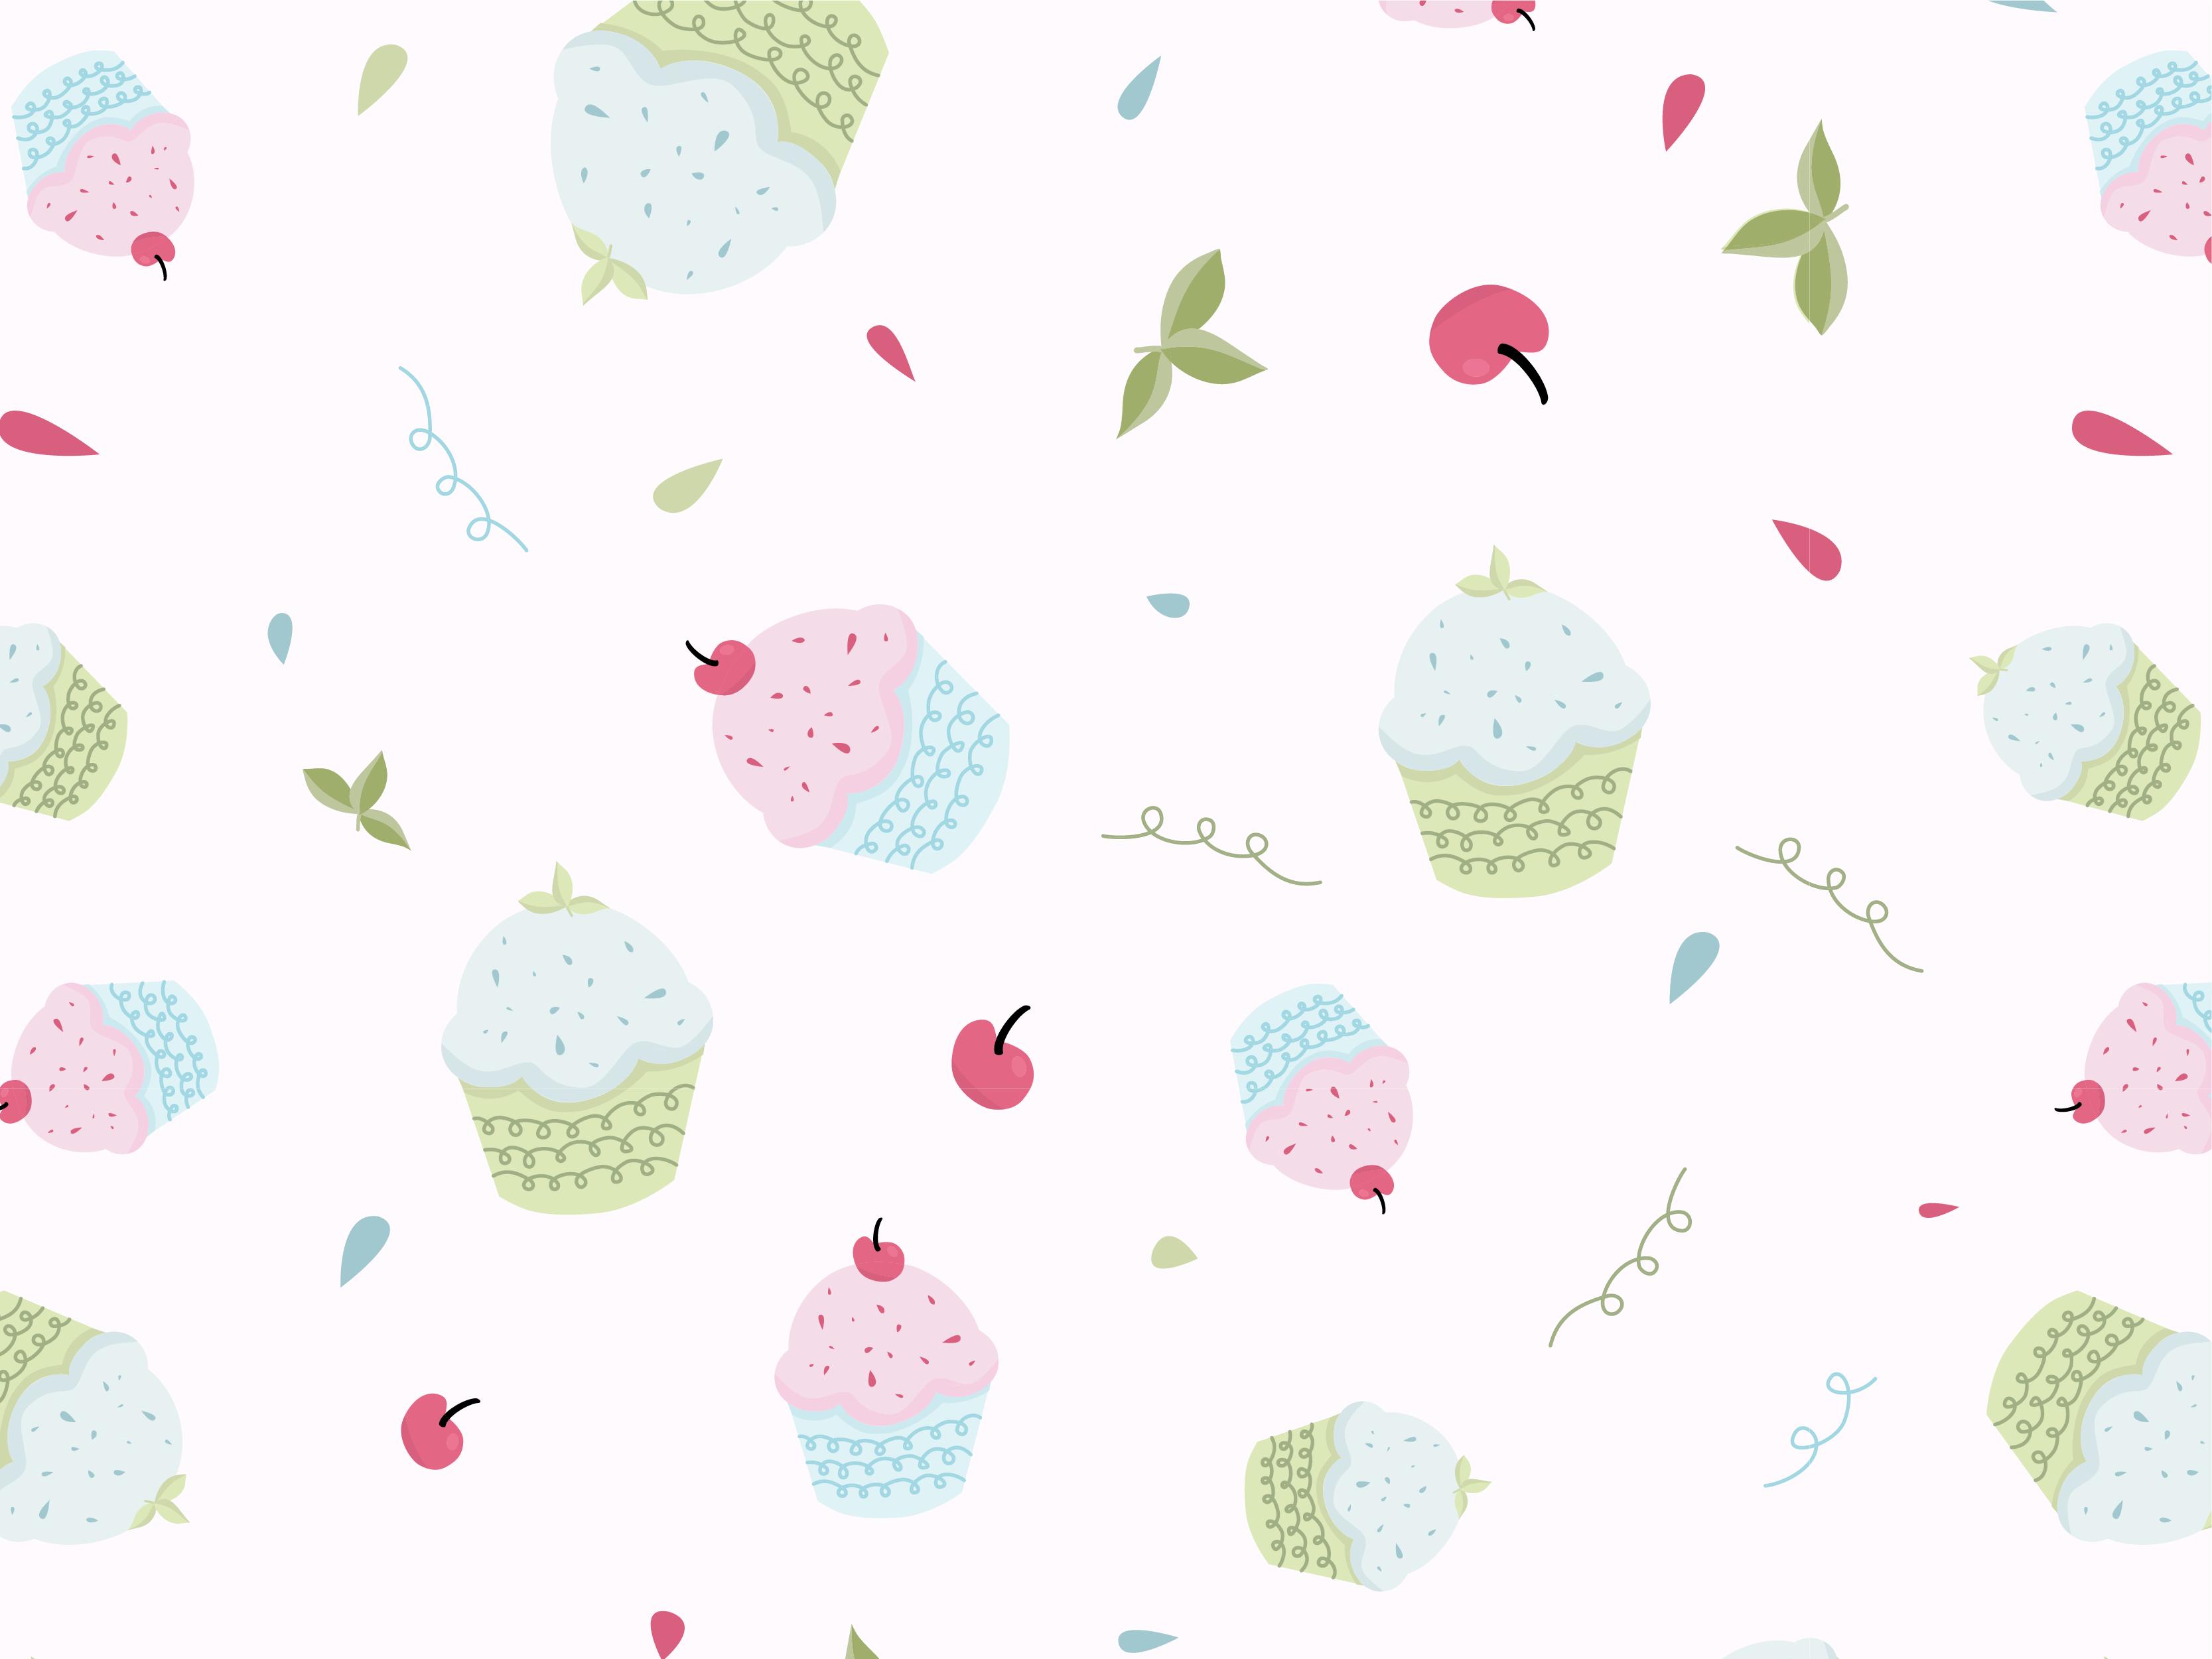 Cupcake pattern drbbbl 02